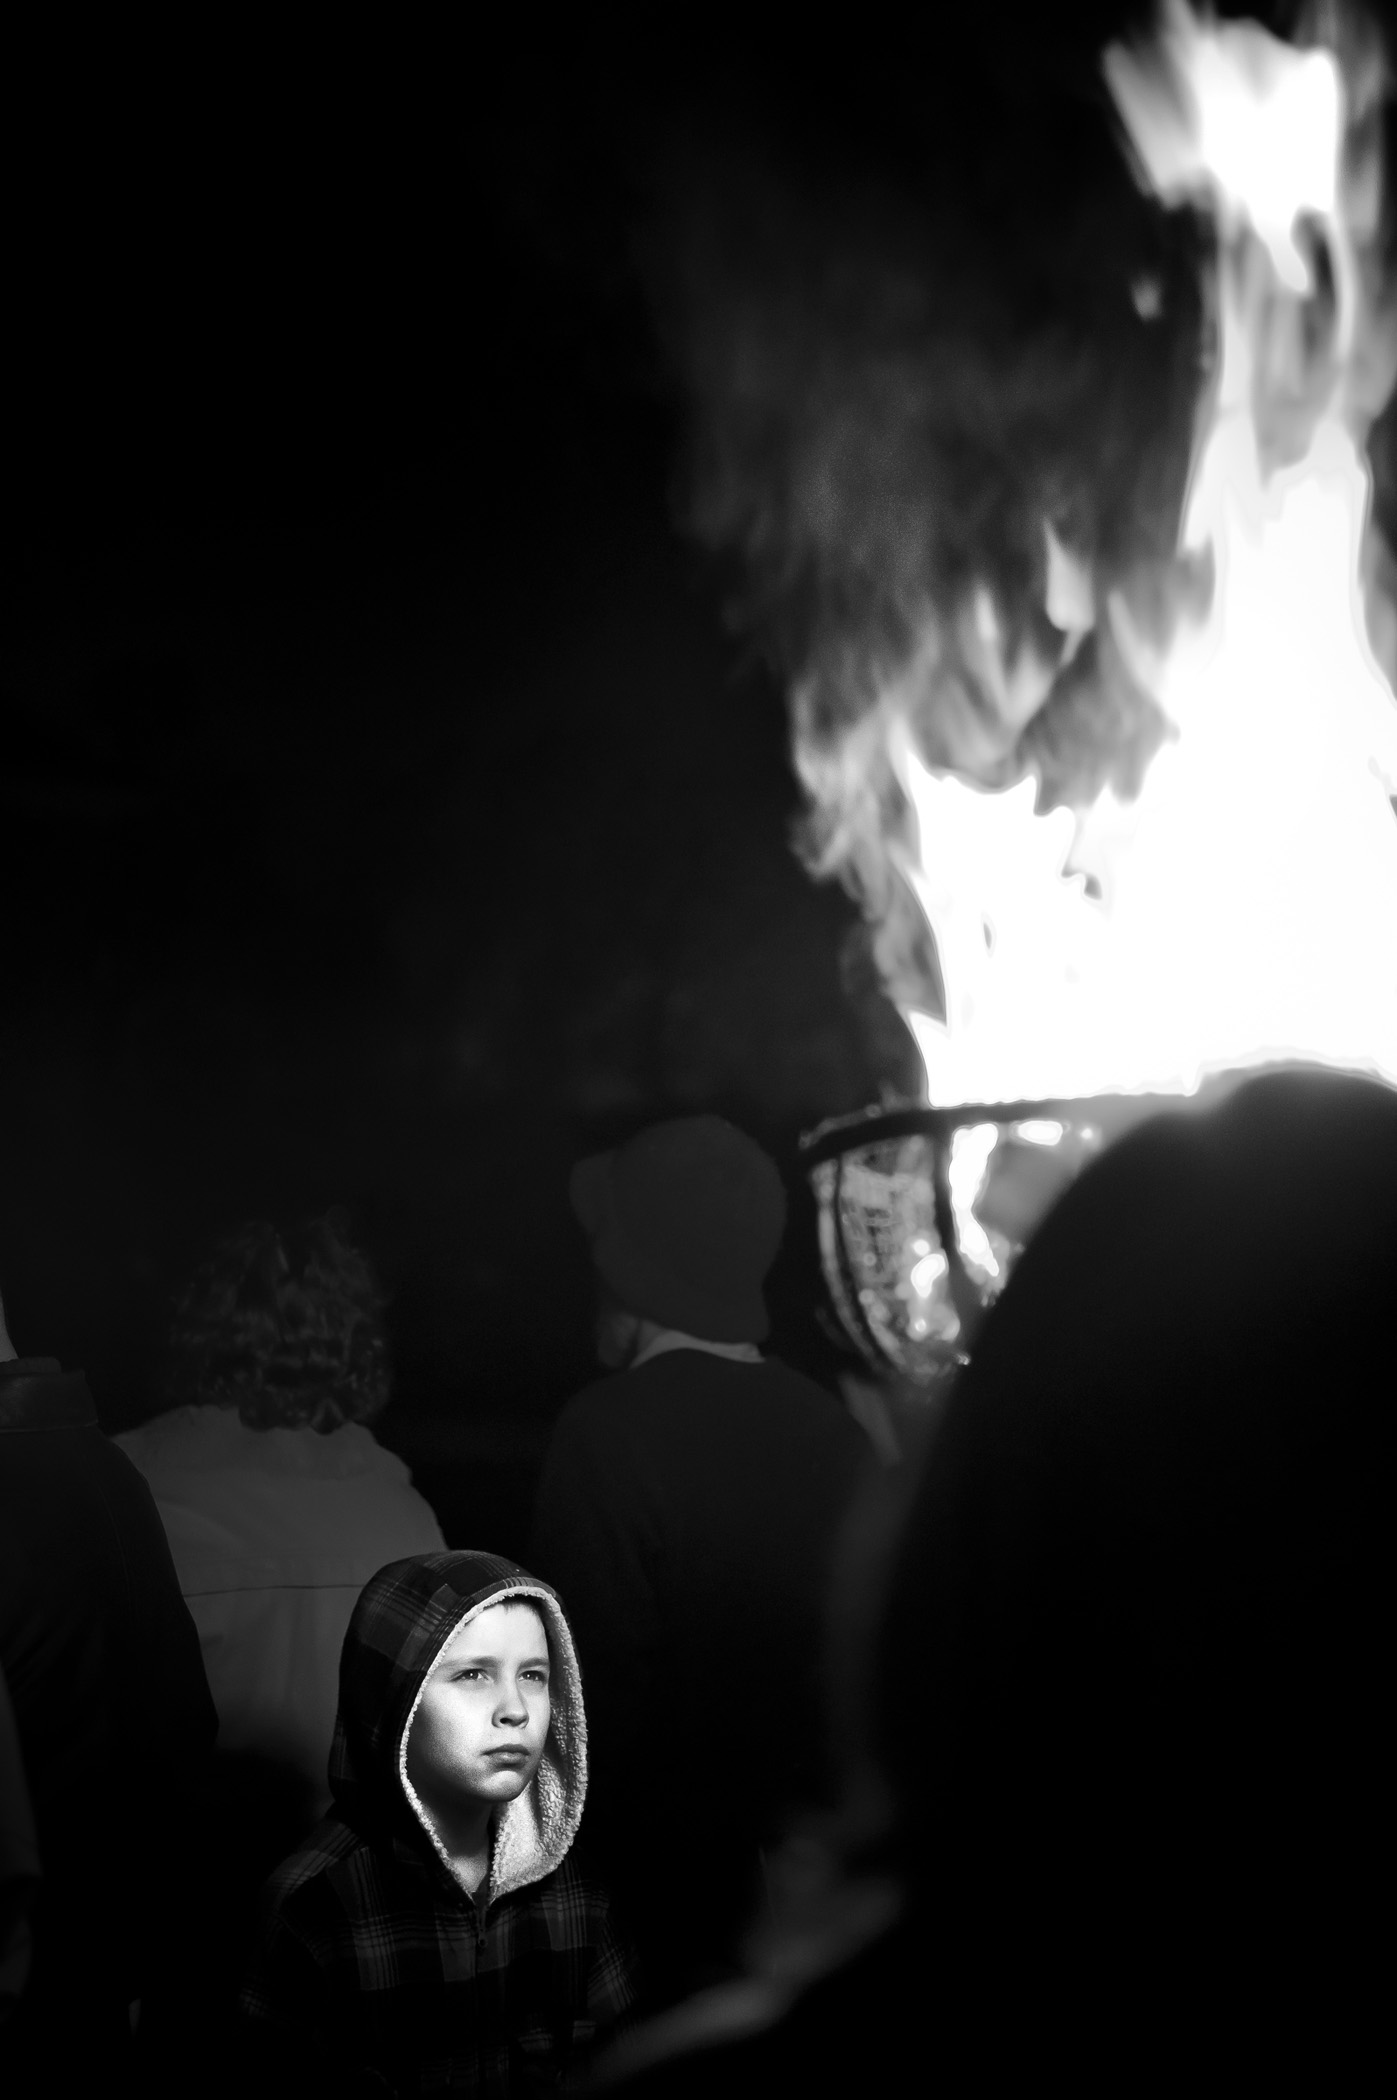 'Untitled #16', 2011